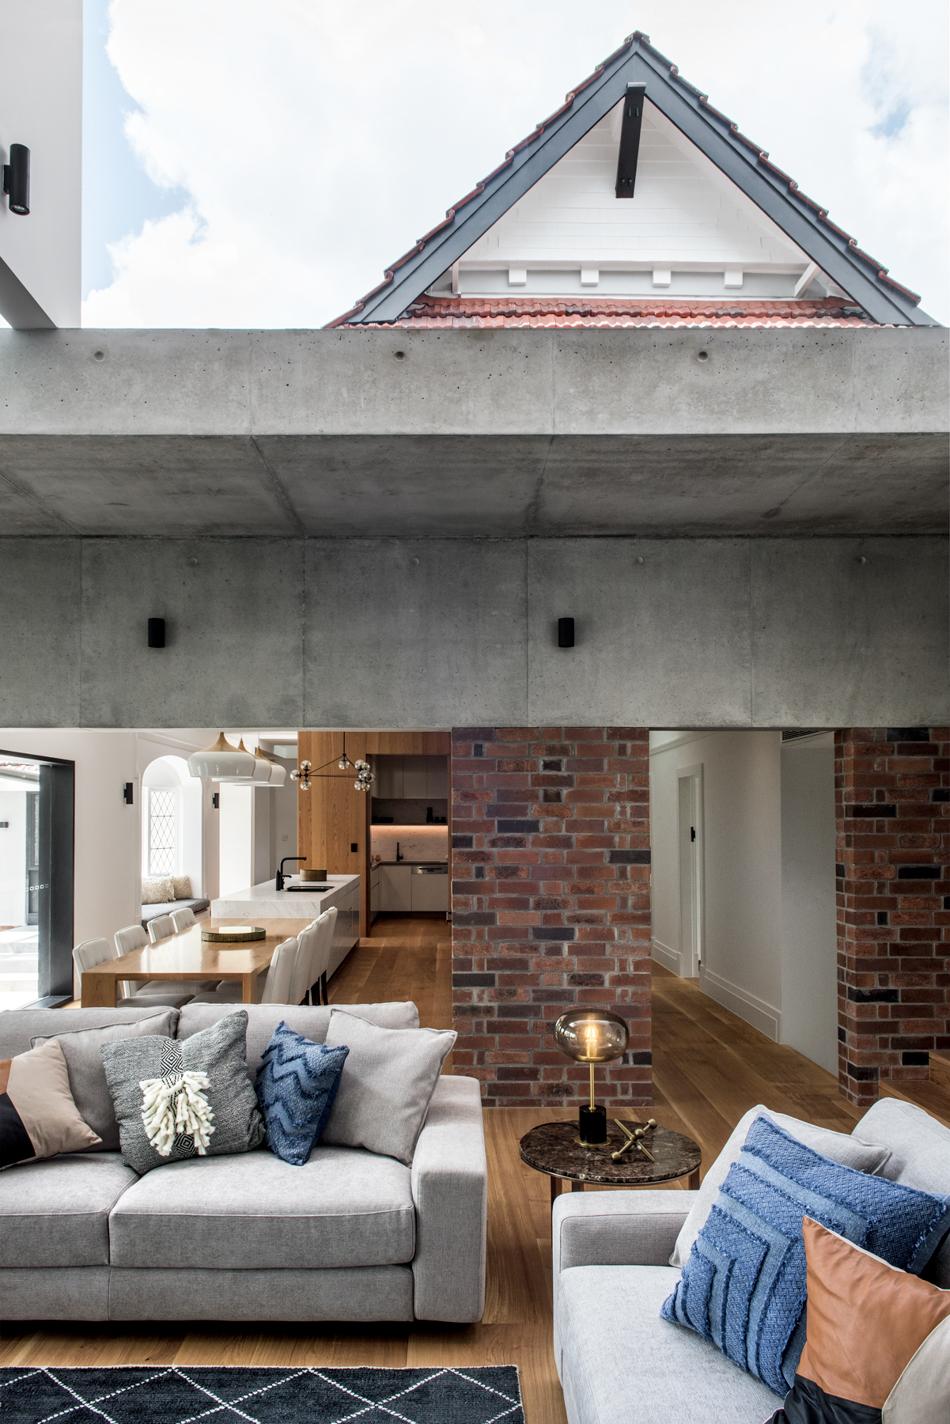 the-terrace-shaun-lockyer-architects-the-design-emotive-15.jpg